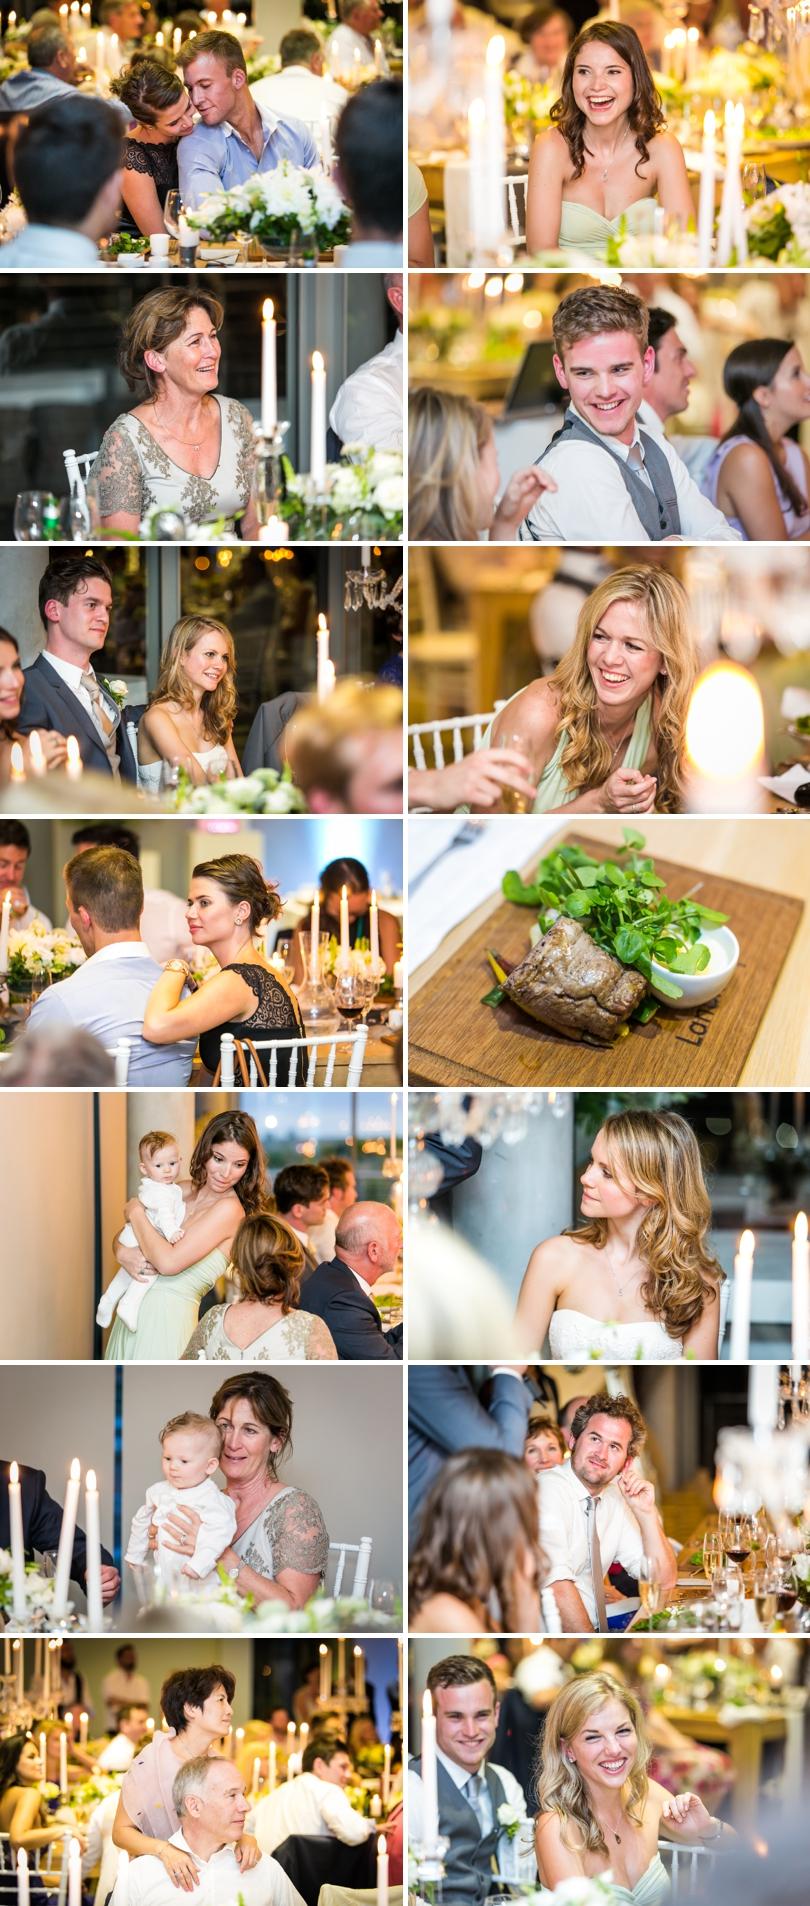 cape_town_wedding_photographer_landtscap_stellenbosch_russell_joanna_claire_nicola_0094